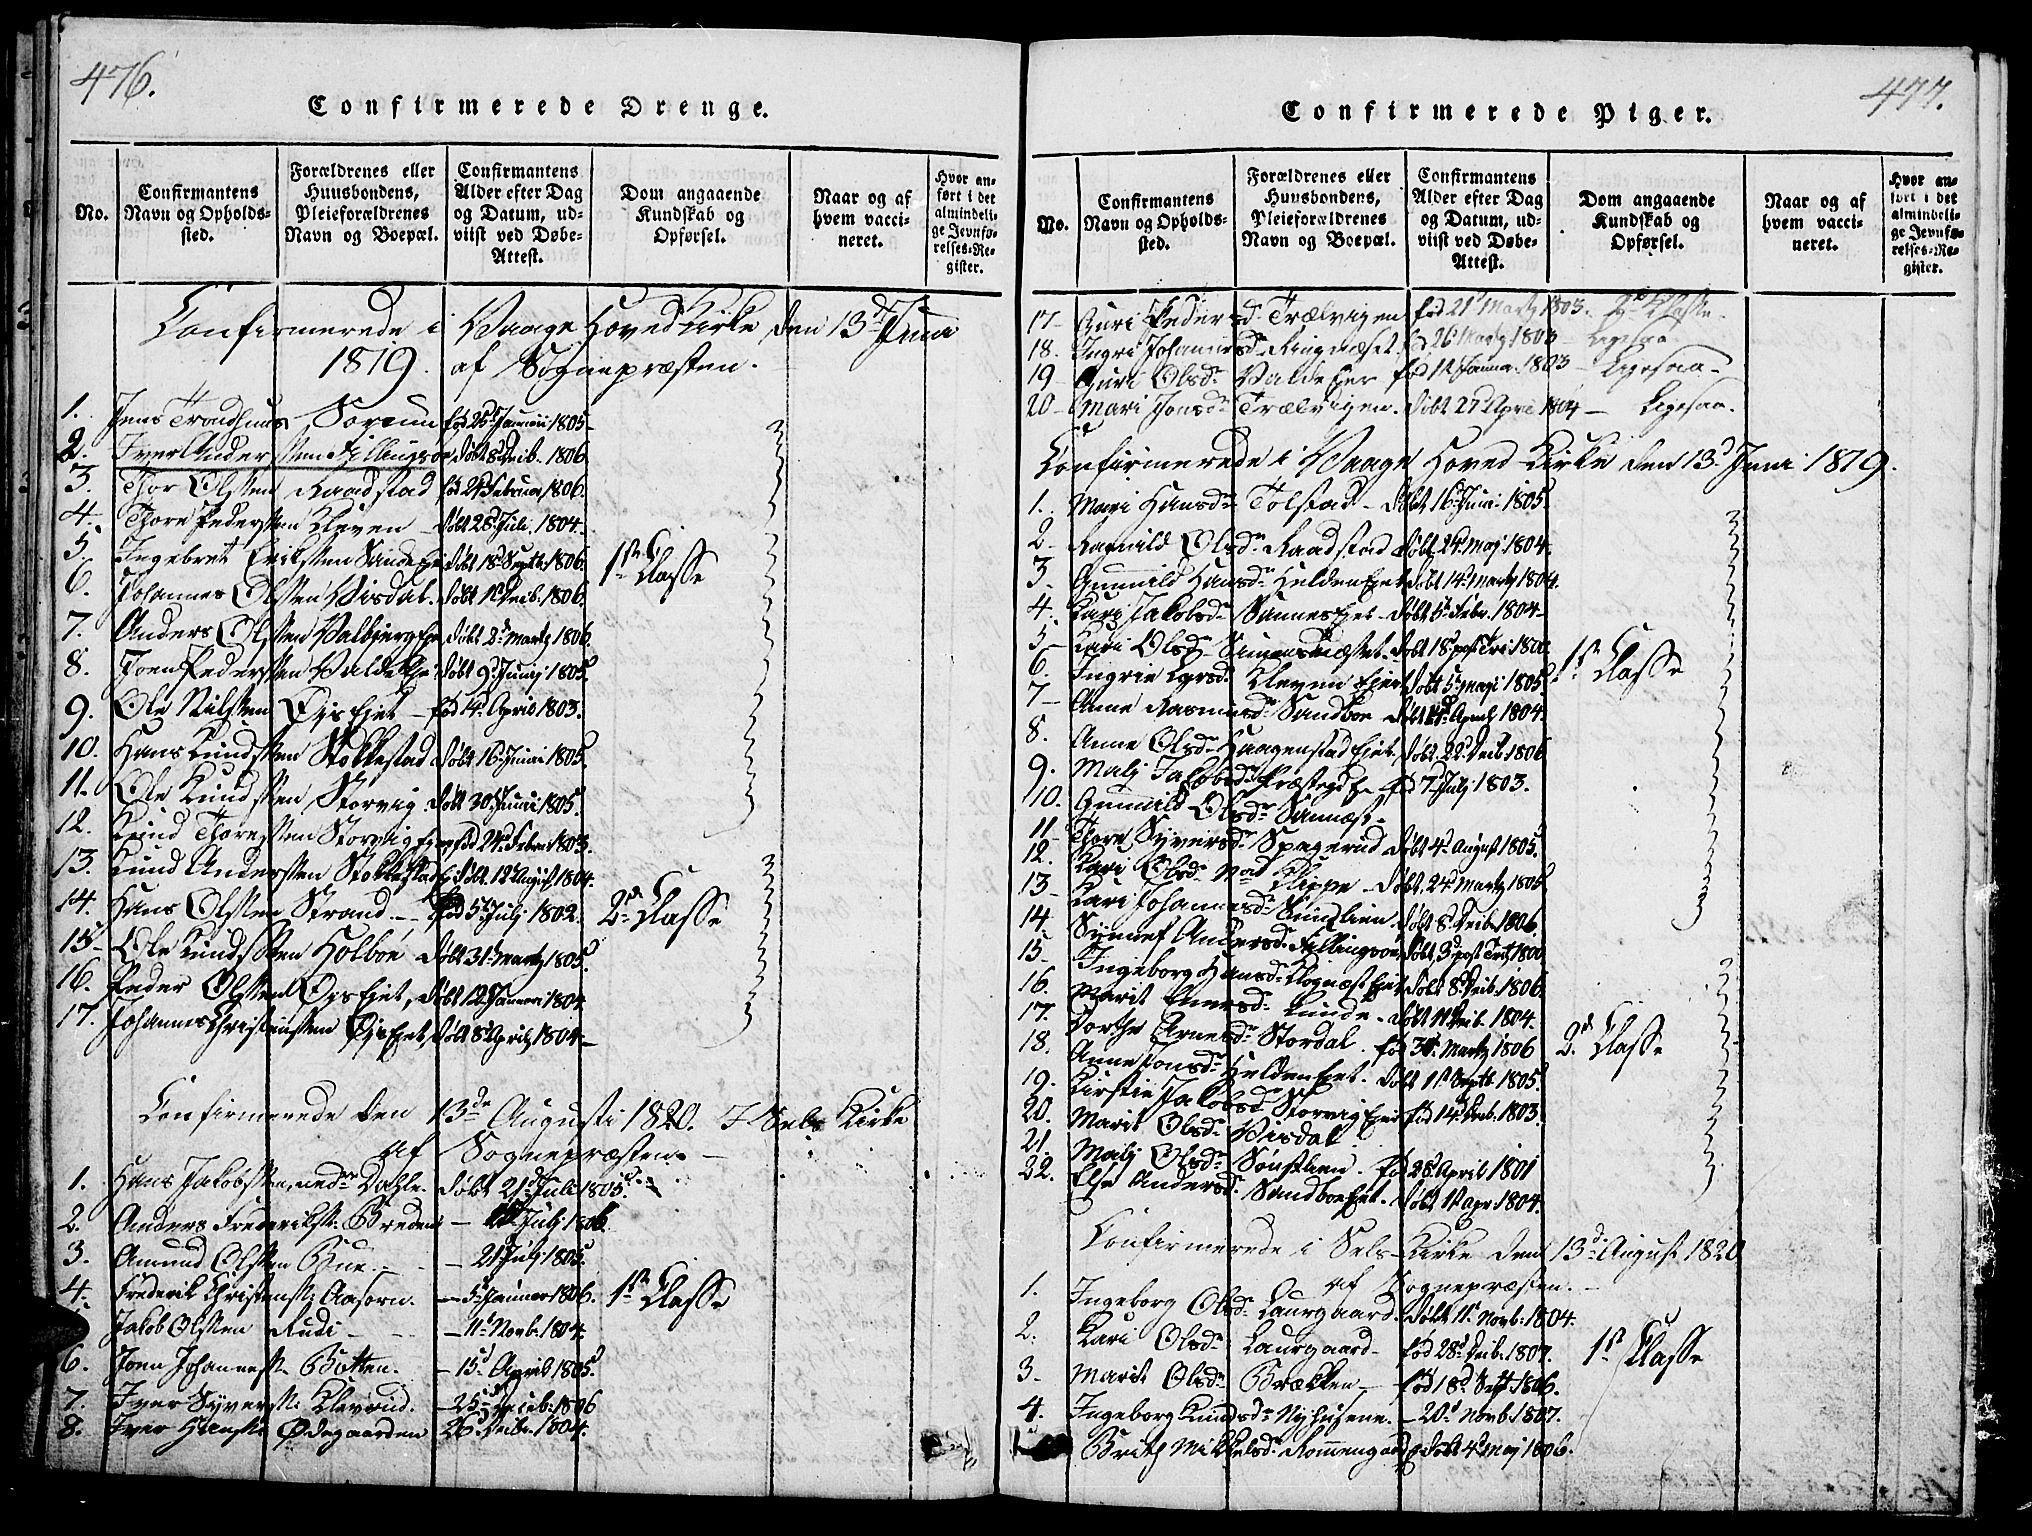 SAH, Vågå prestekontor, Ministerialbok nr. 3, 1815-1827, s. 476-477